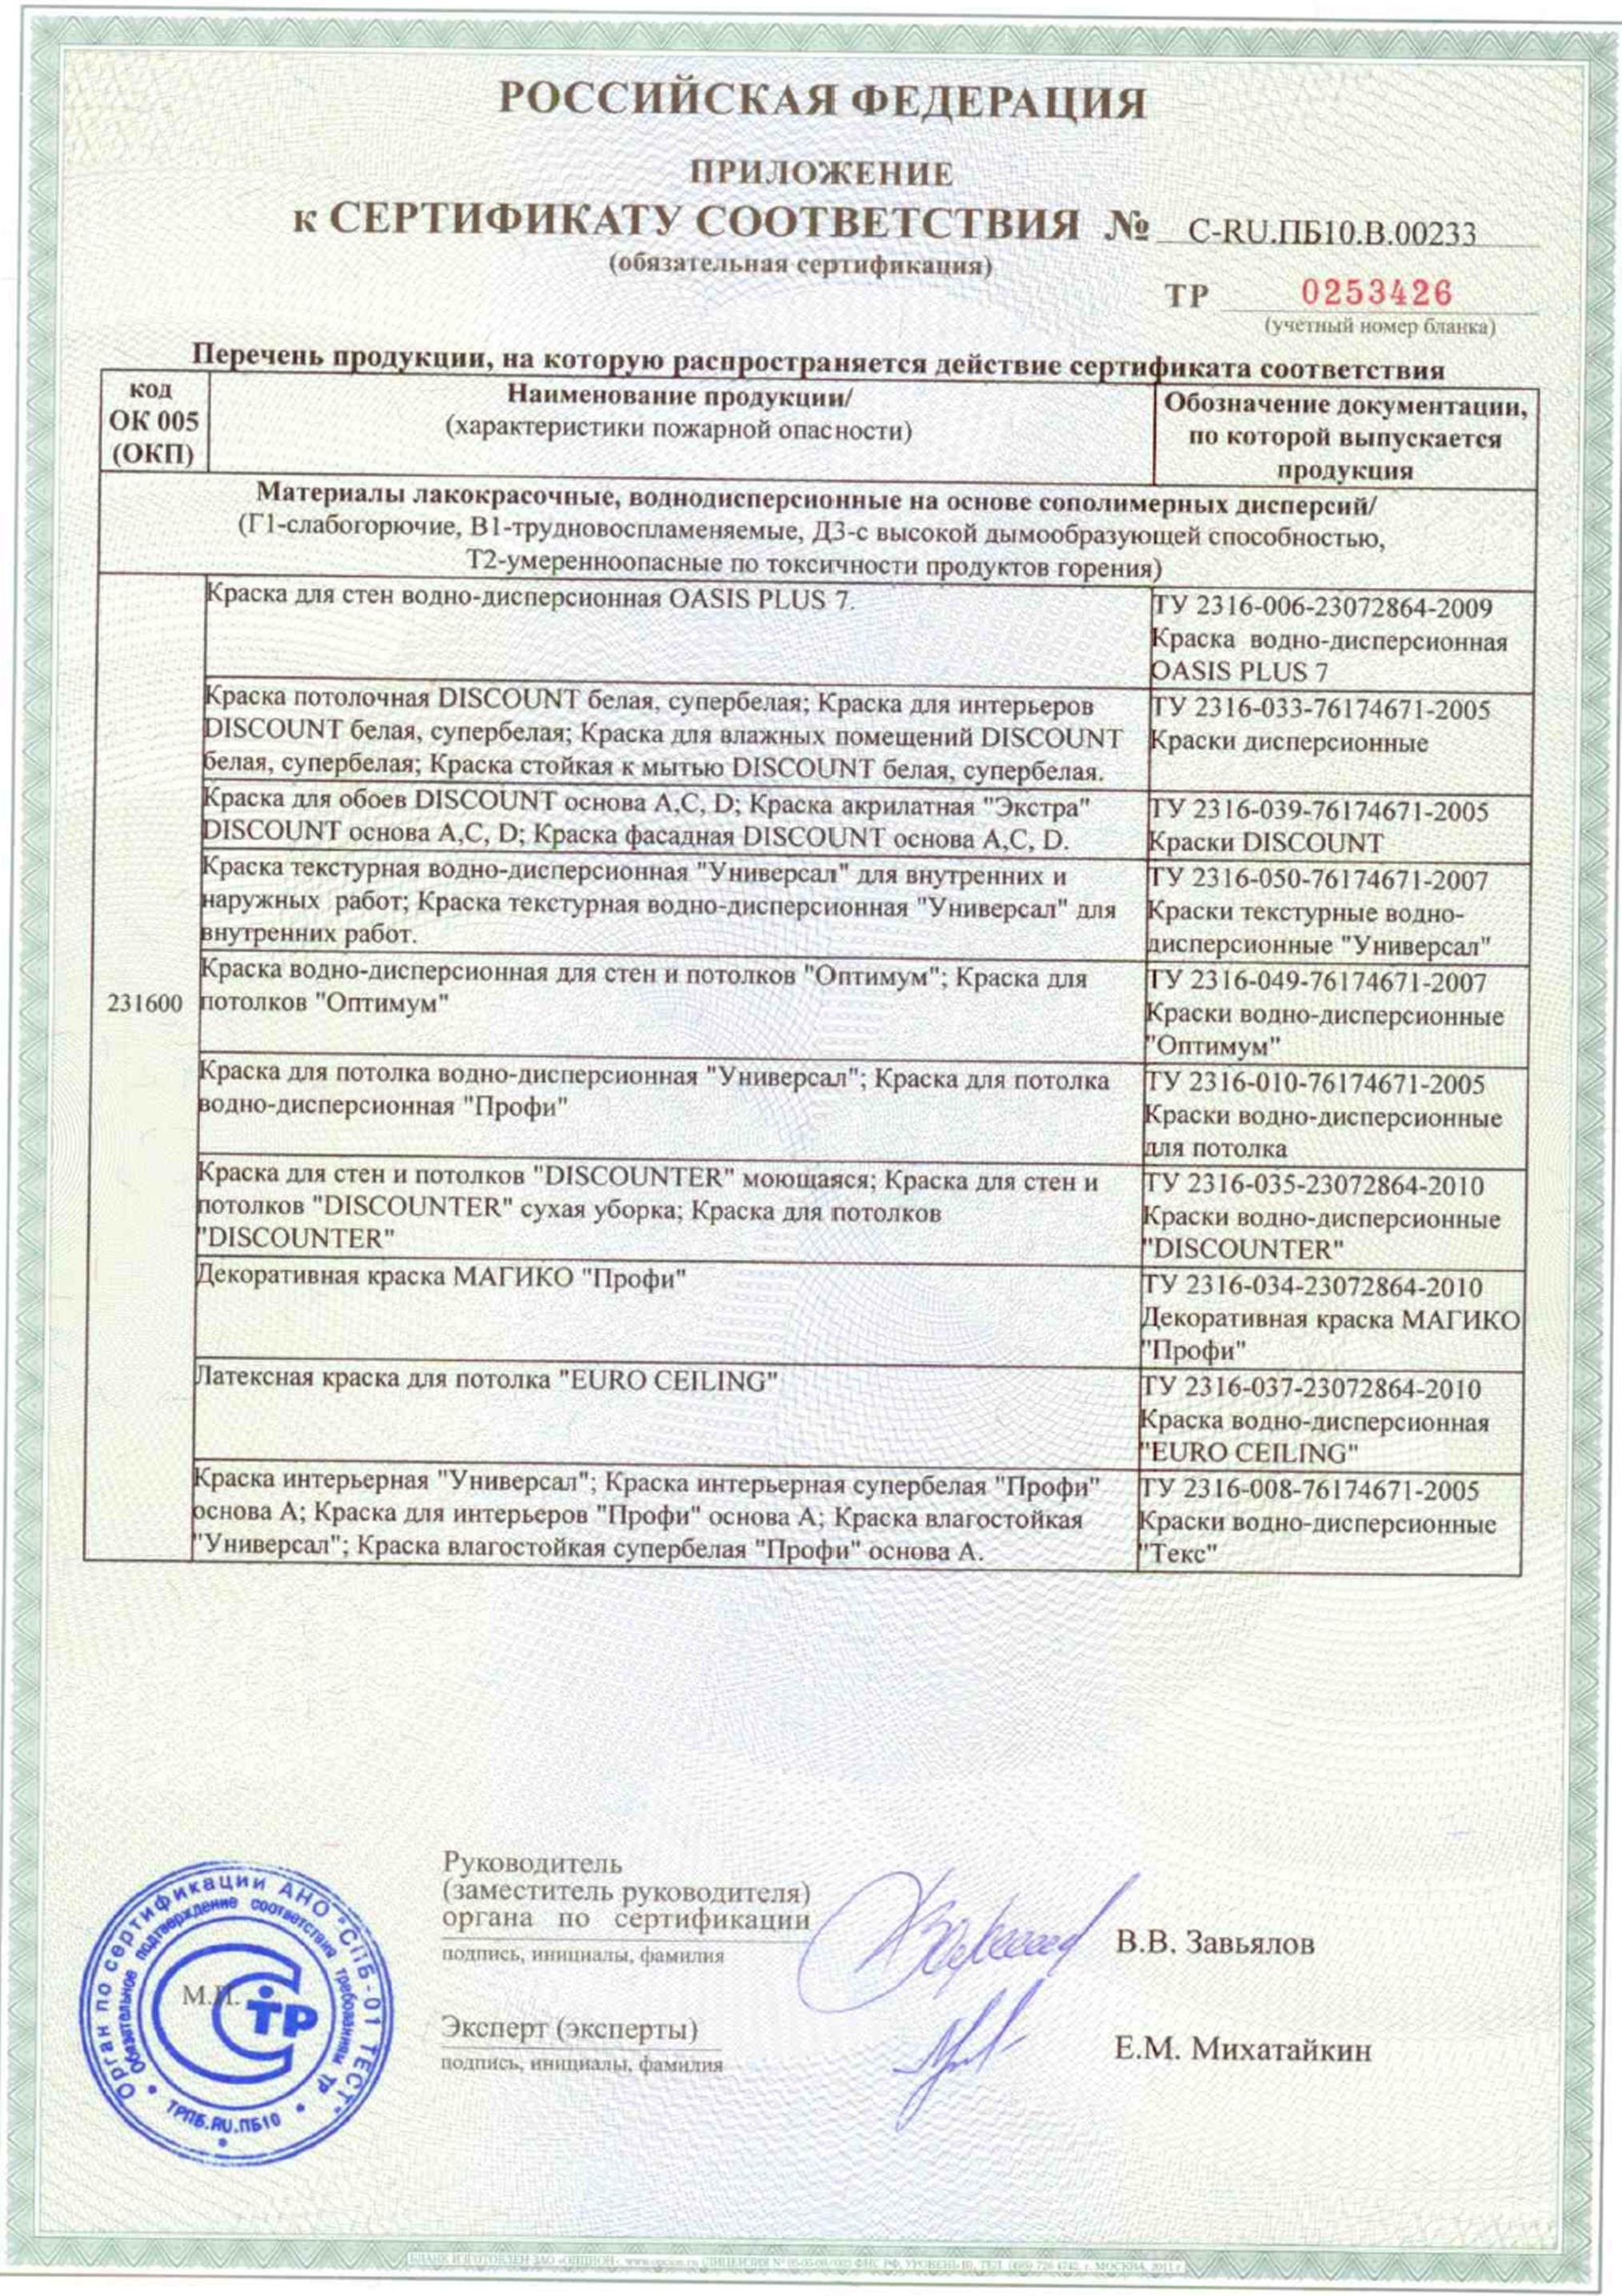 Сертификат На Вд-Краску Оптимист